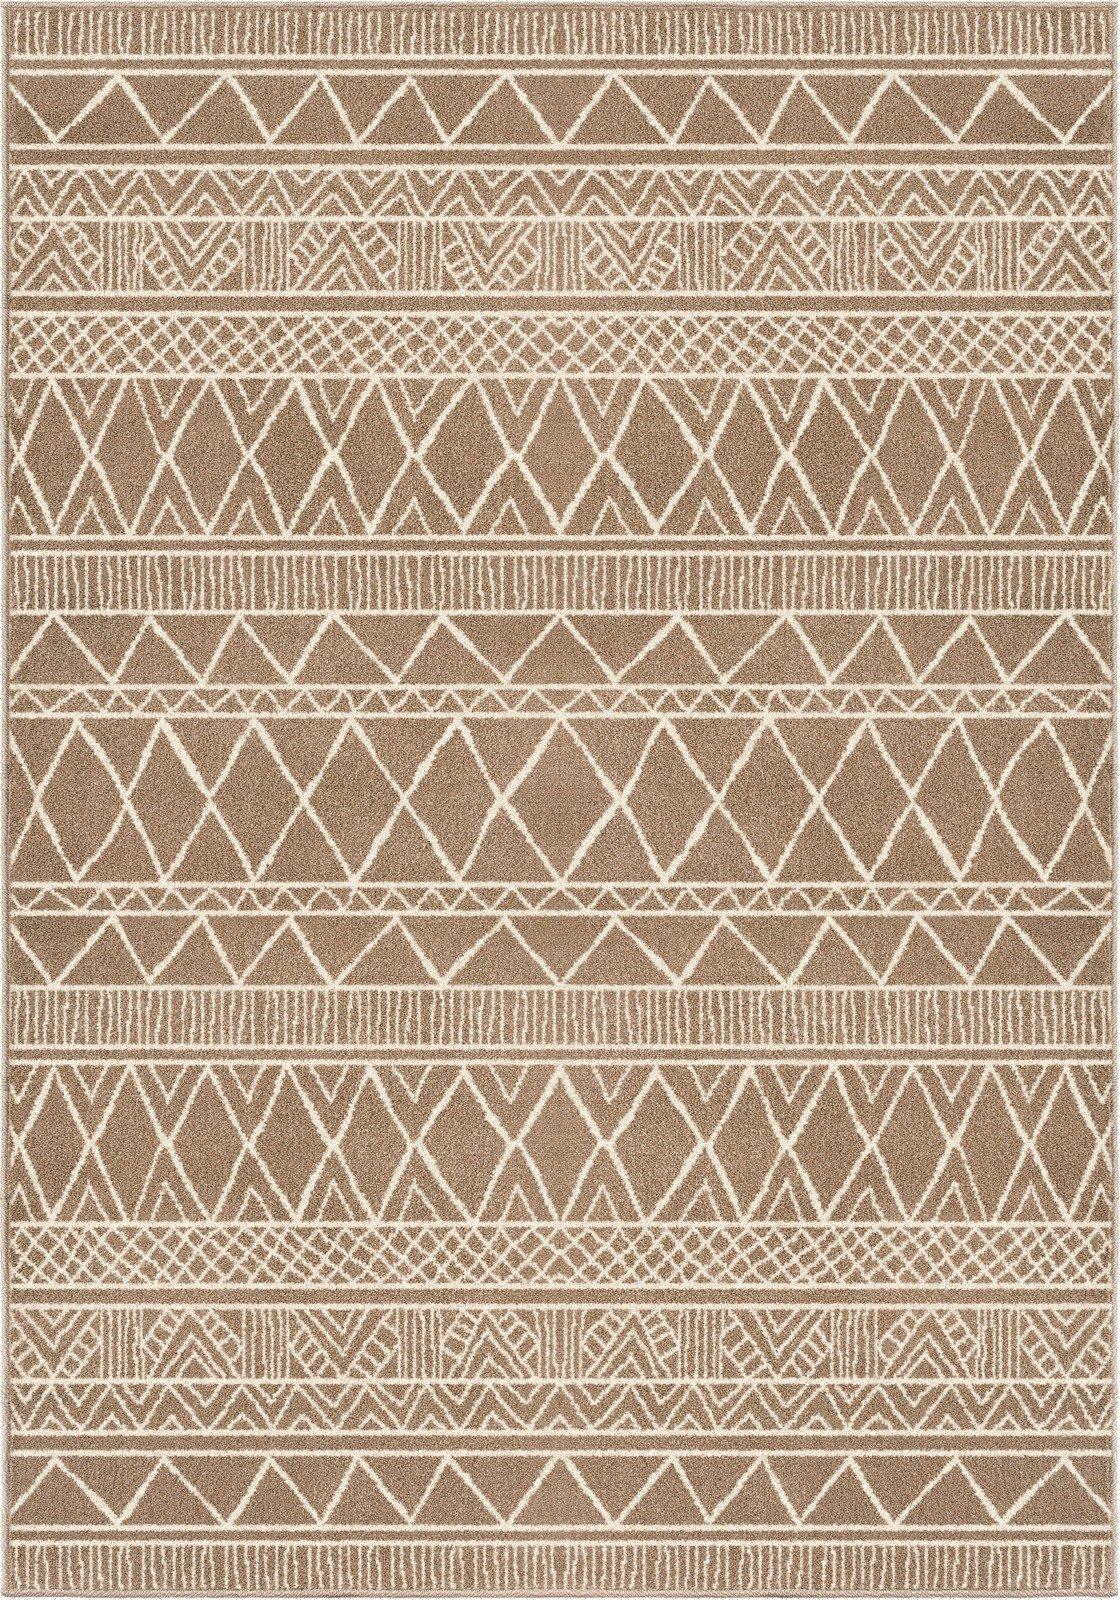 Farmhouse rug | Great Lakes Carpet & Tile